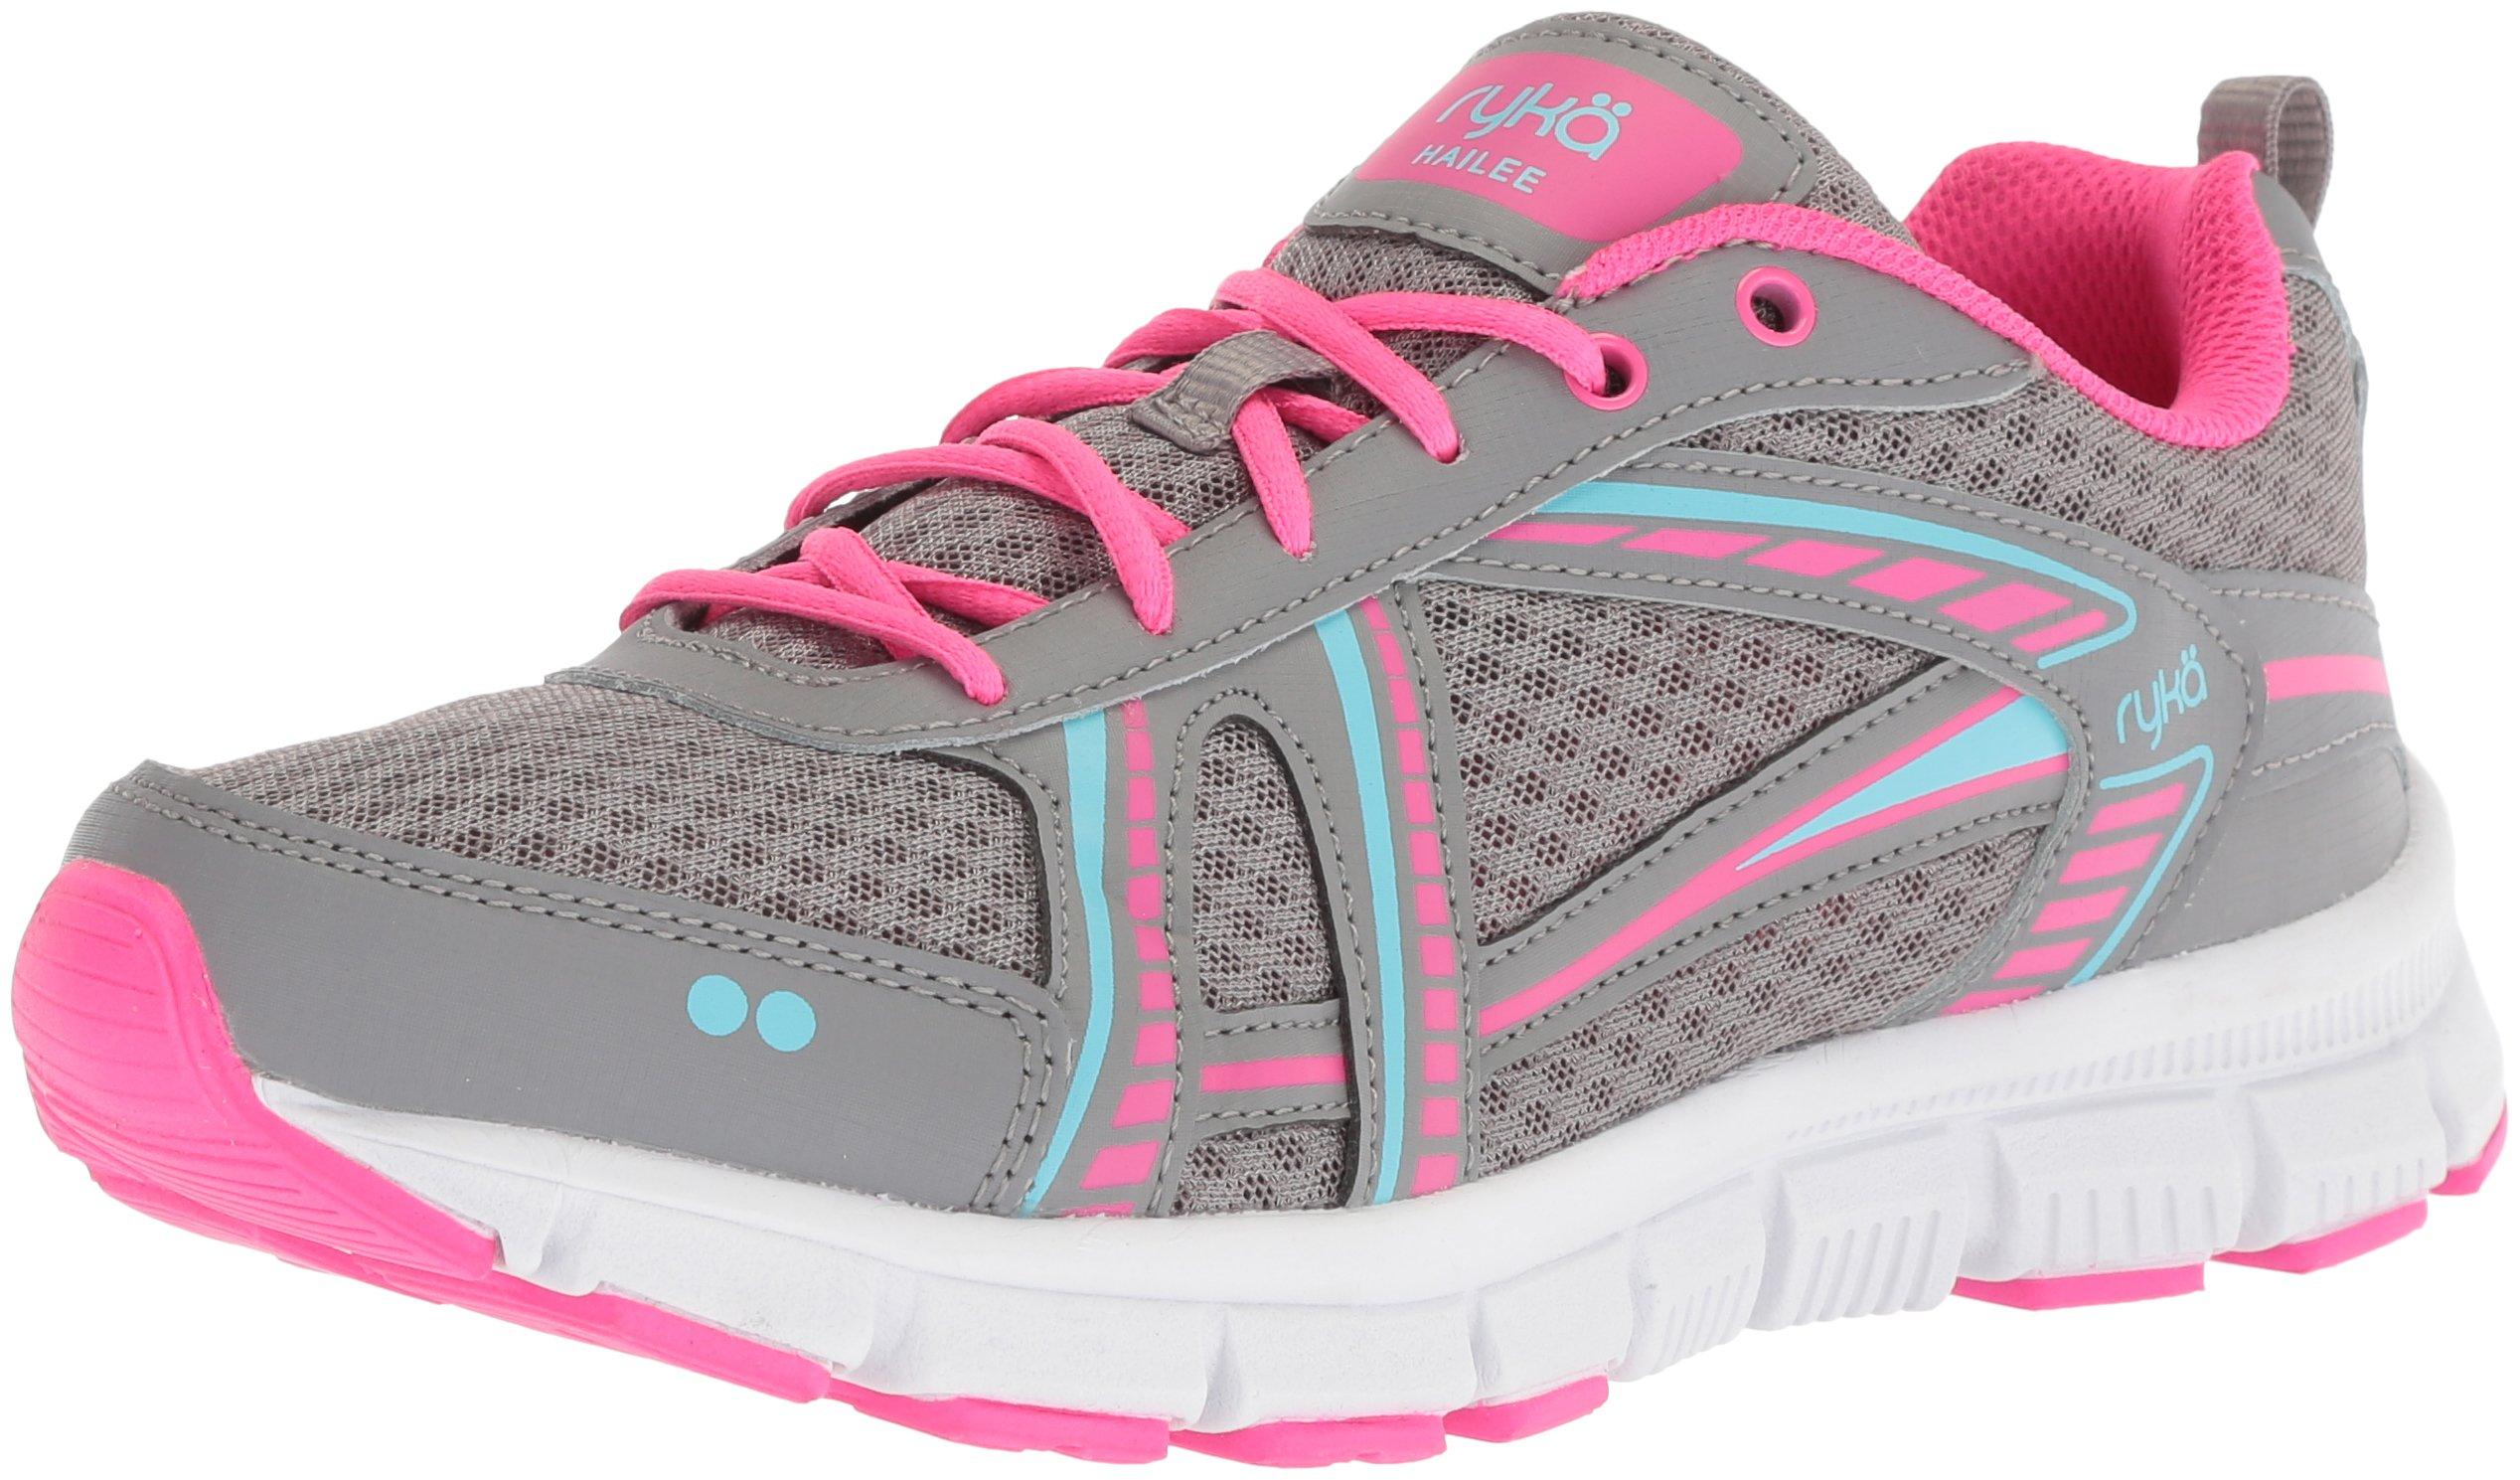 Ryka Women's Hailee Cross Trainer, Grey/Pink/Blue, 10 M US